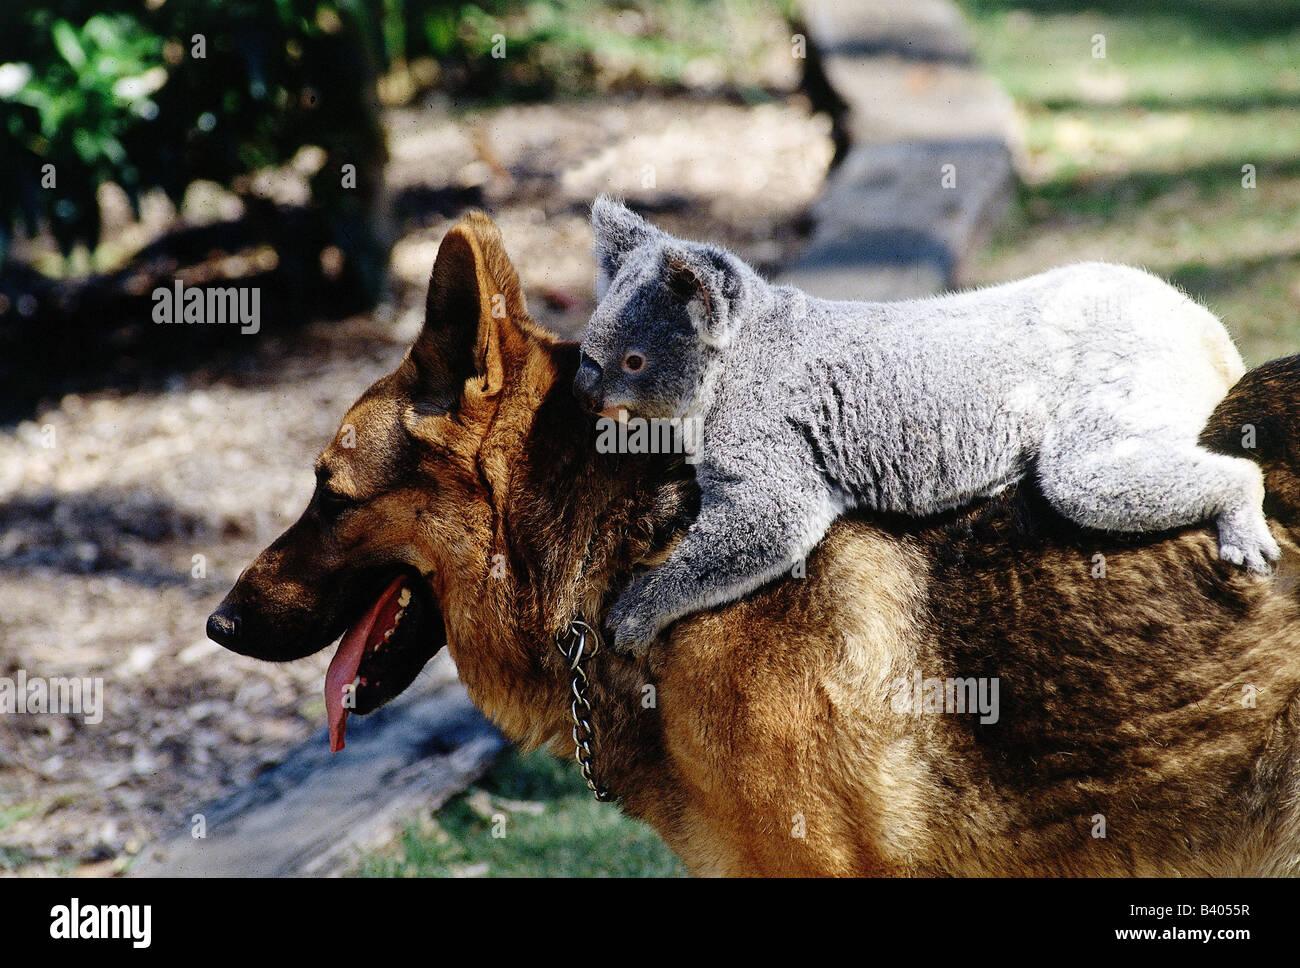 [Image: zoology-animals-features-animal-friendsh...B4055R.jpg]